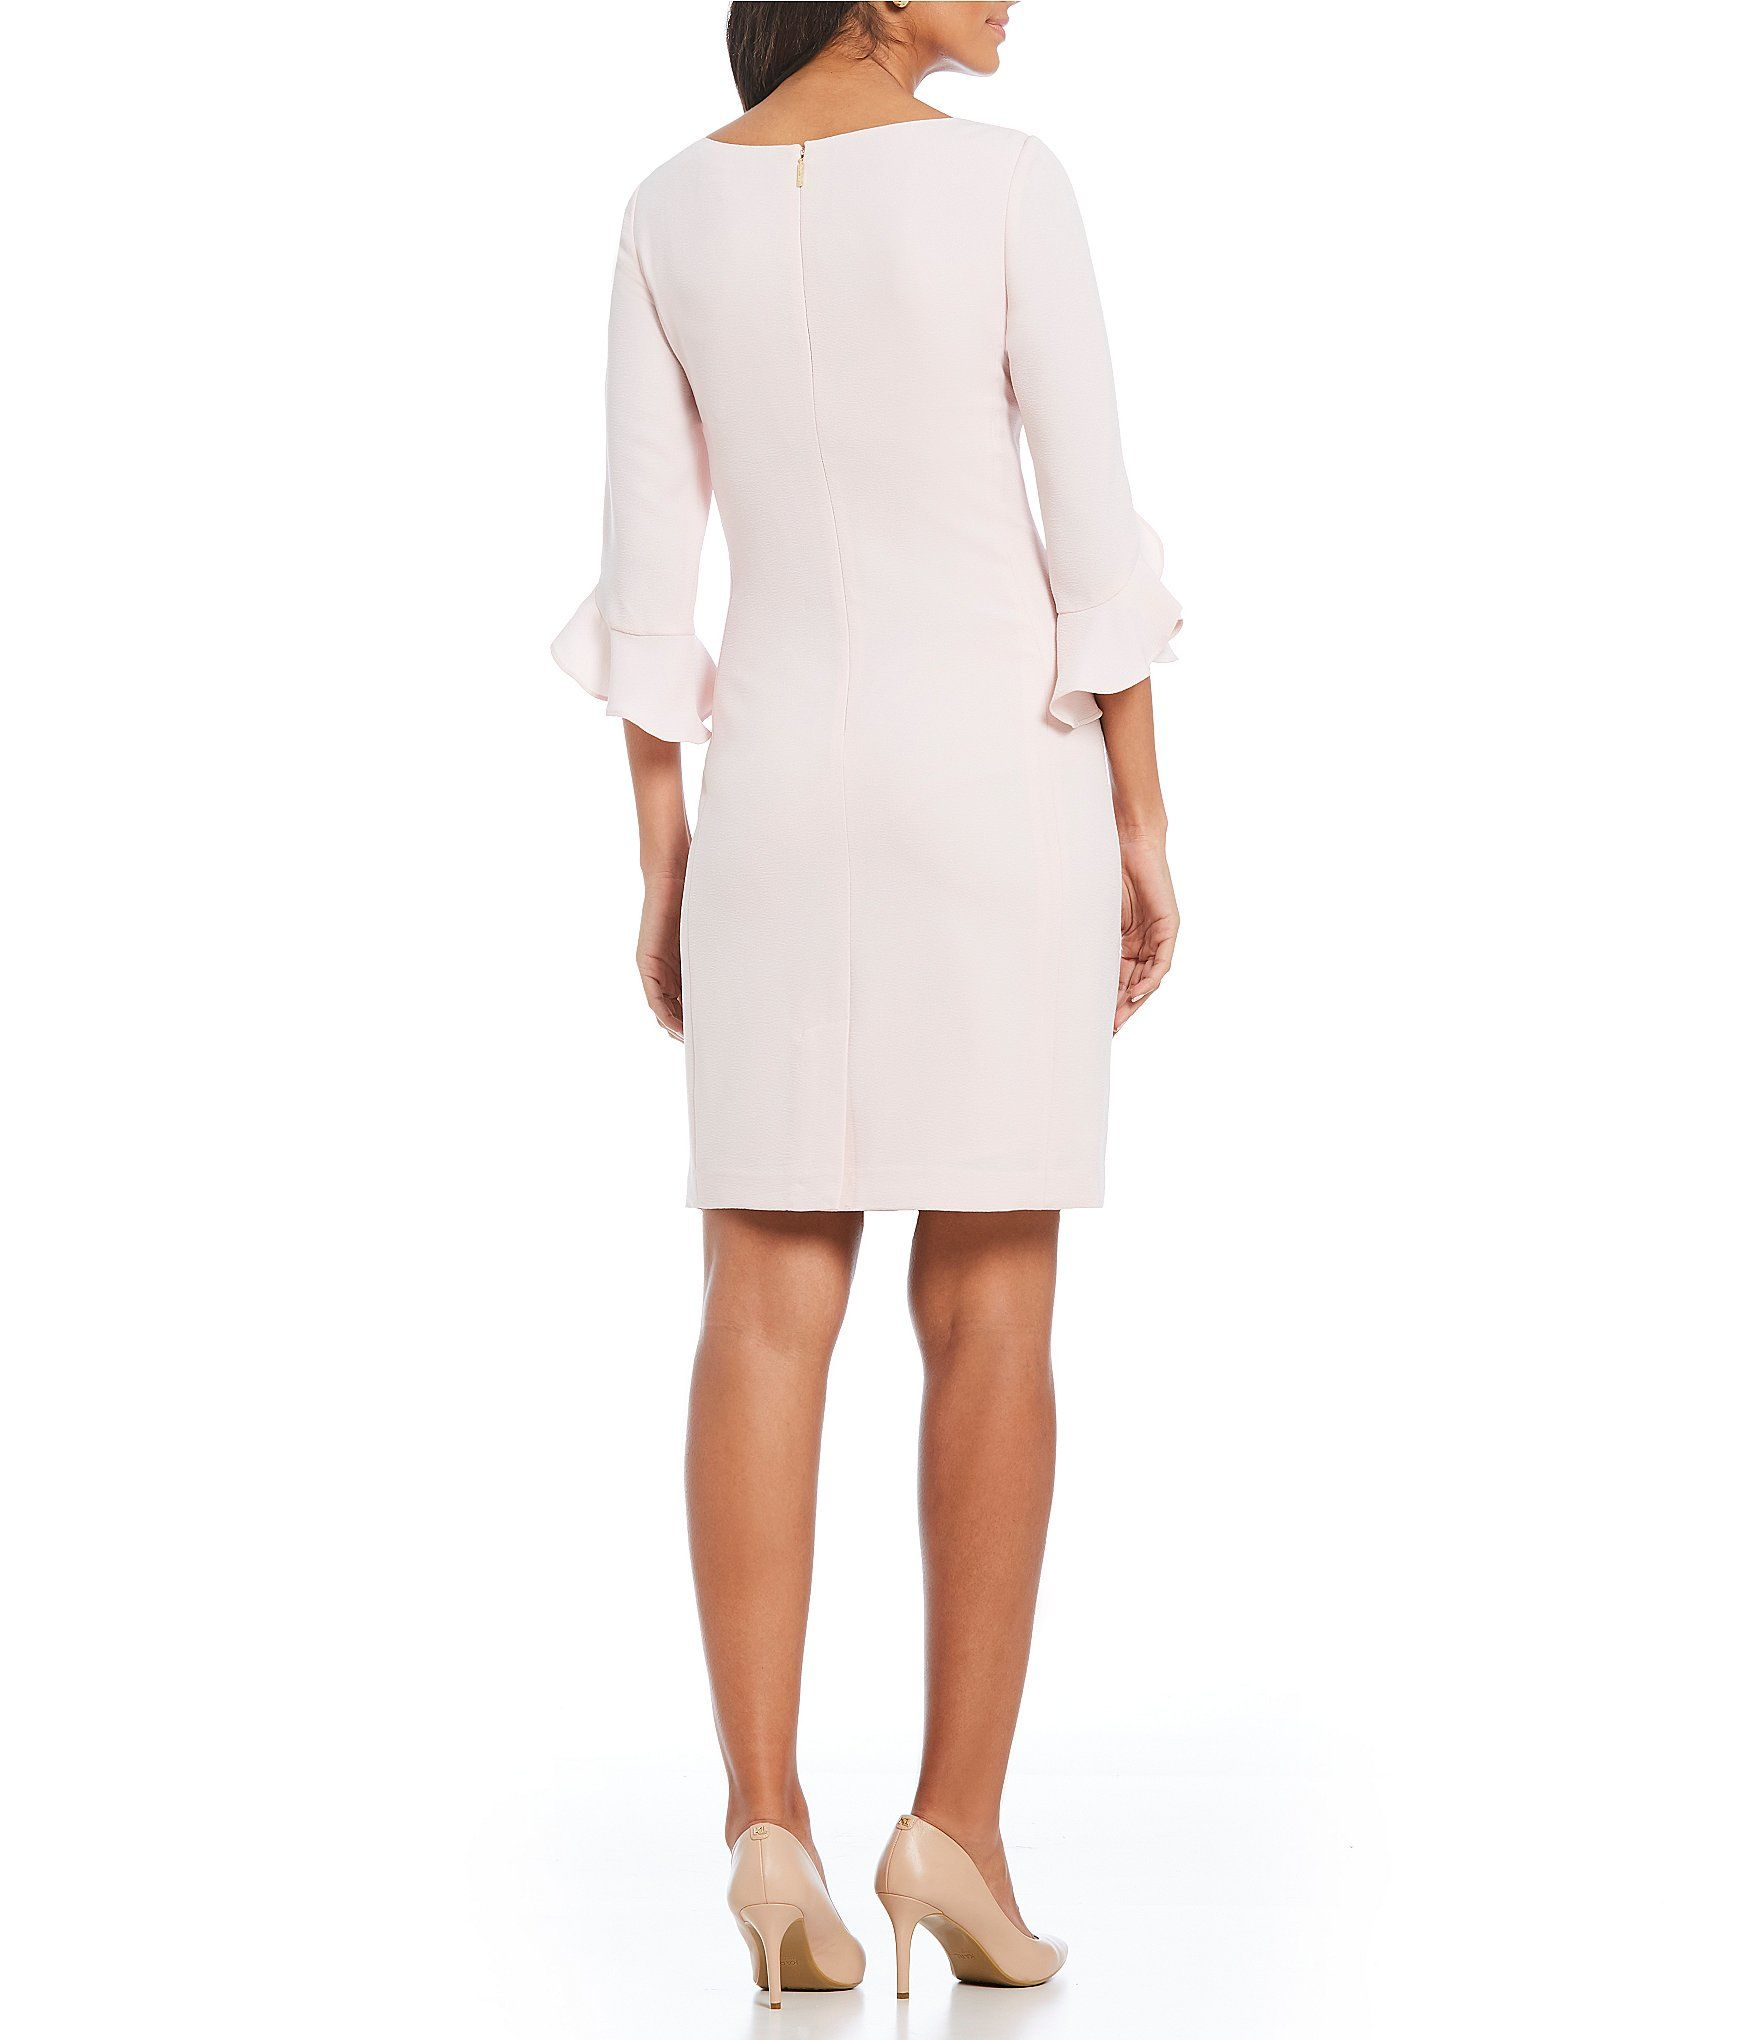 817013e3 Loooks white but is rose pink - $99-KARL LAGERFELD PARIS Tulip Bell Sleeve  Crepe Dress #Dillards